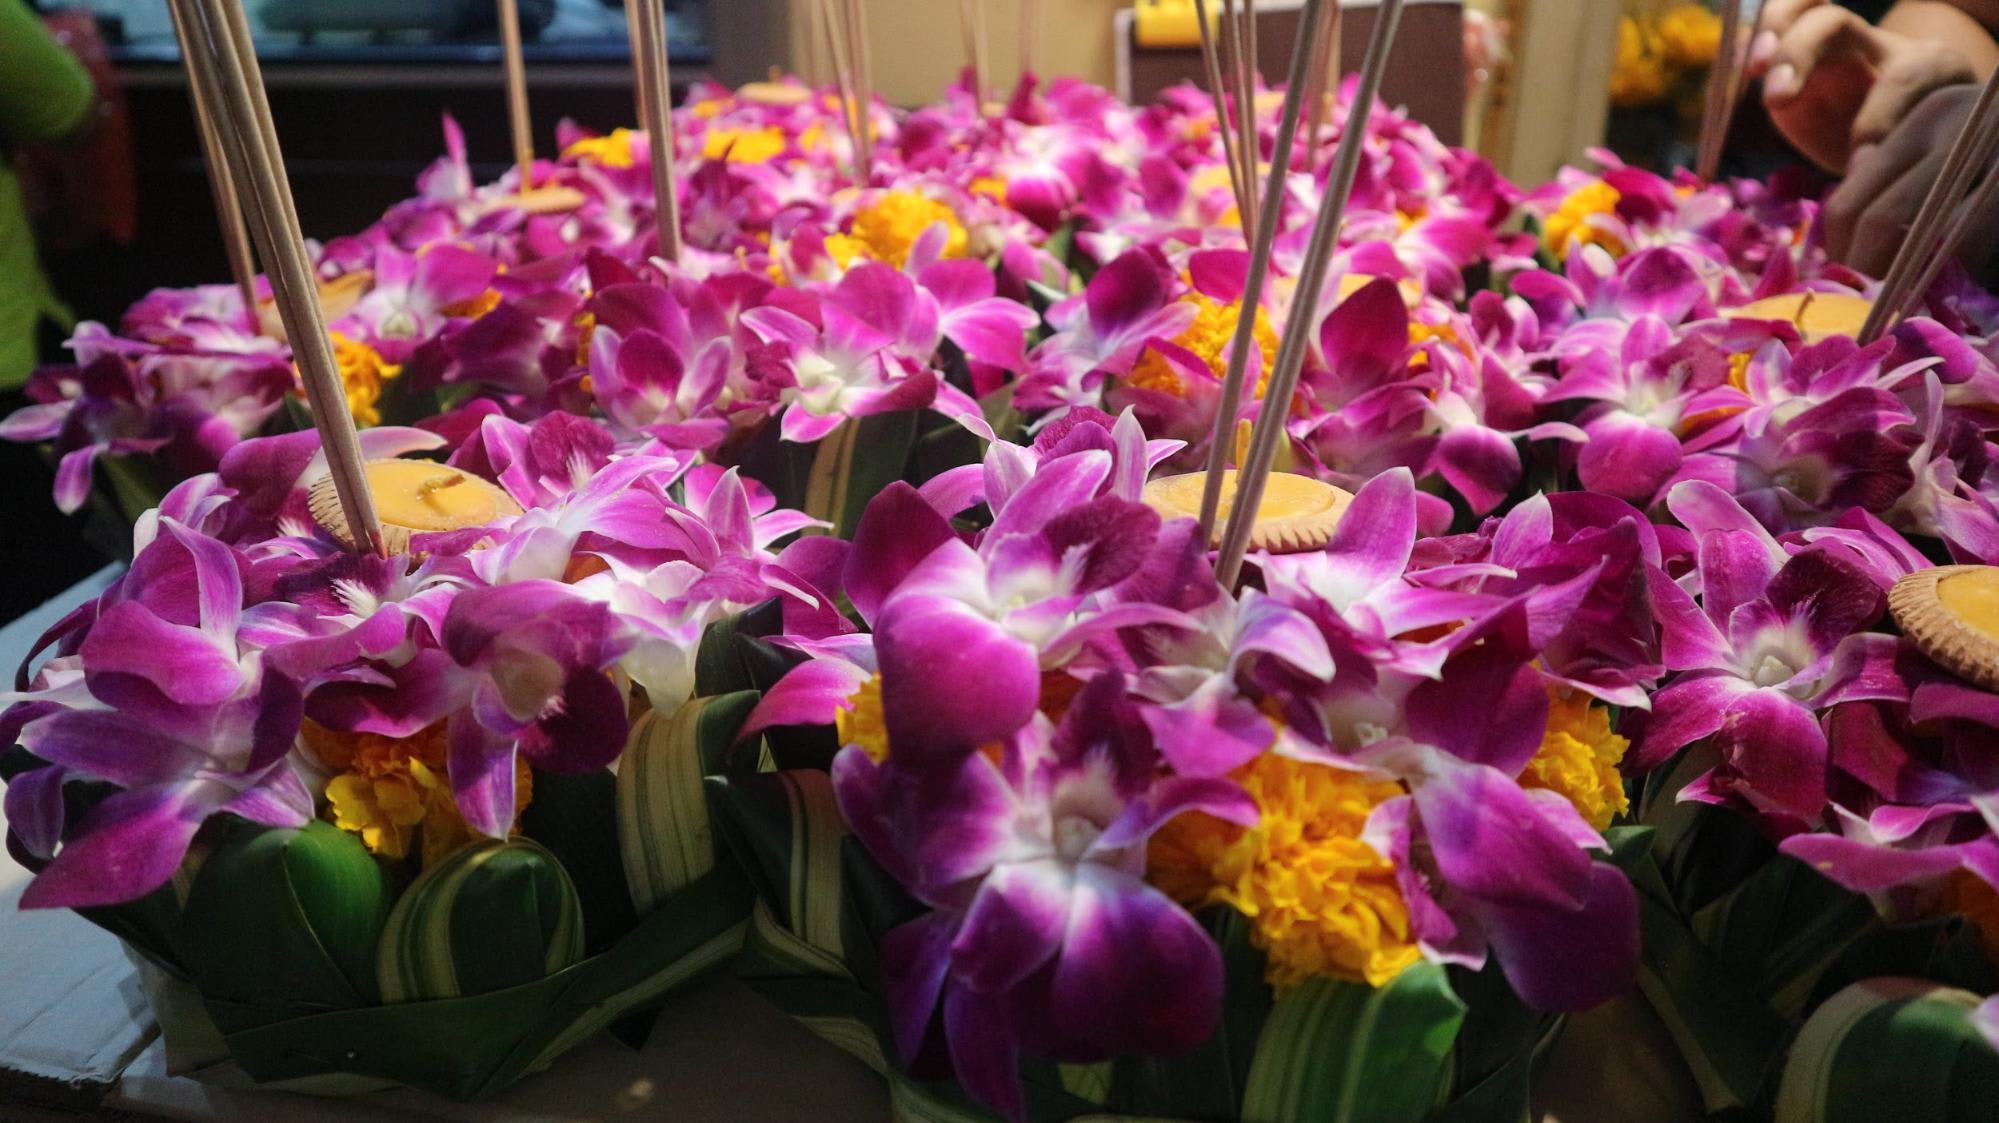 hoa ở lễ hội loy krathong bangkok